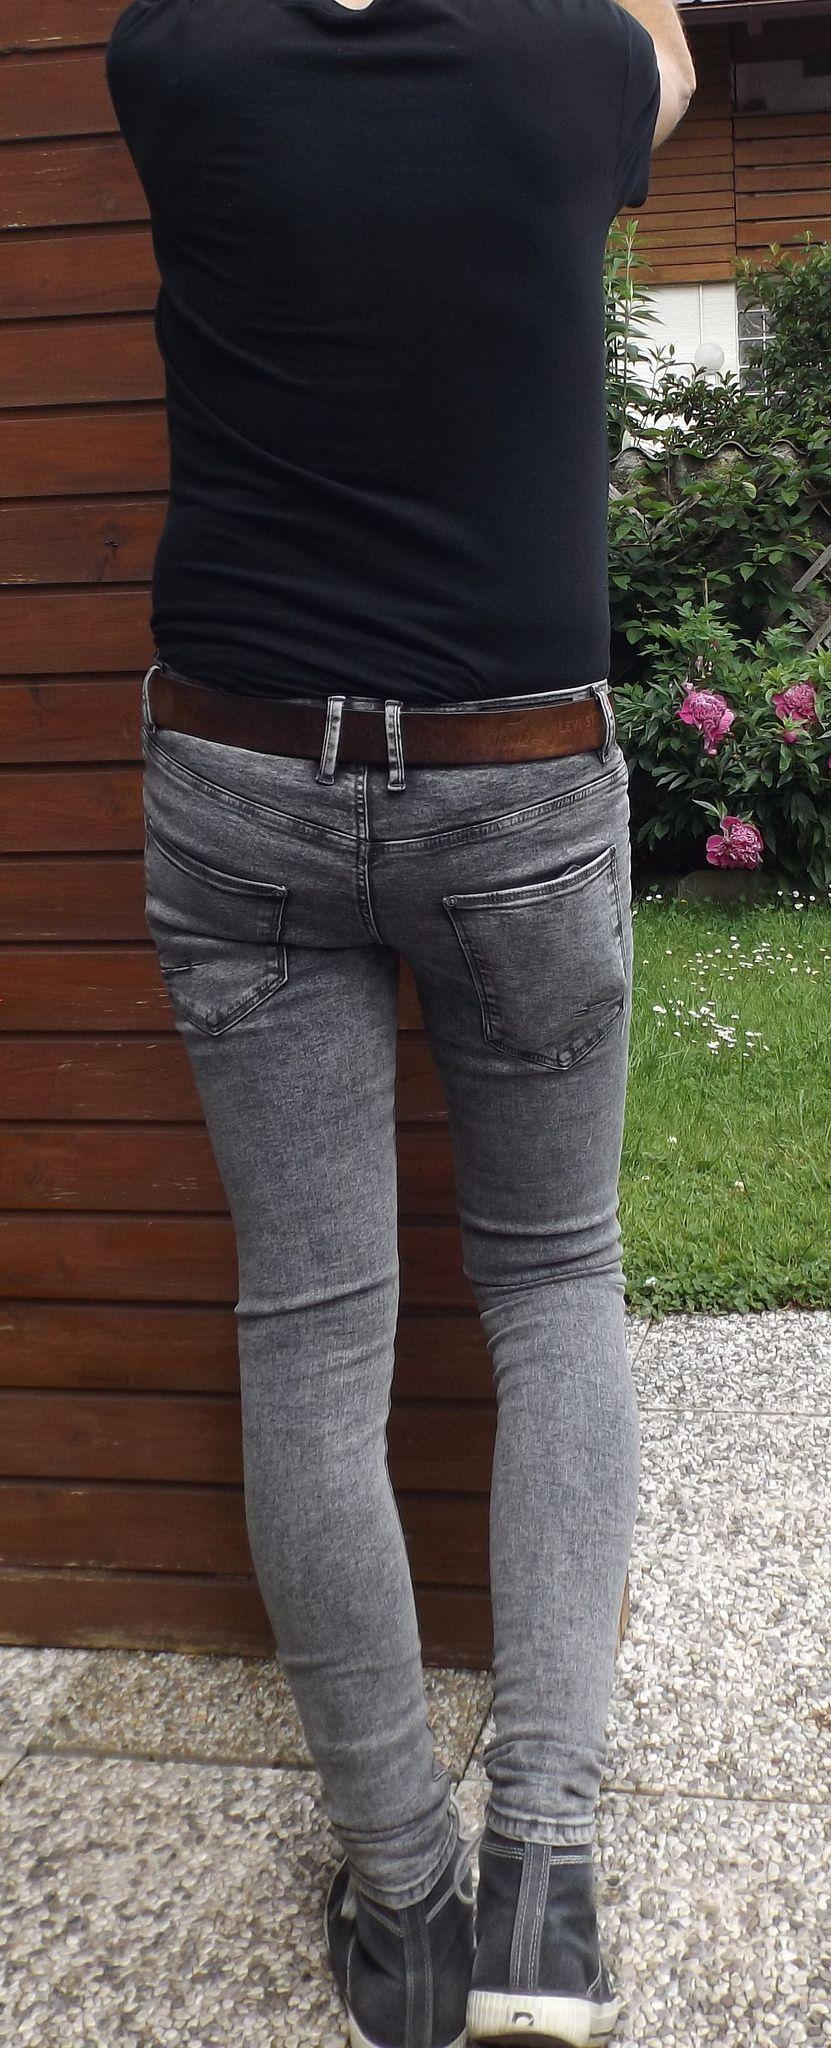 Bershka Super Skinny Super Skinny Jeans Men Skinny Jeans Men Skinny Jeans Boys